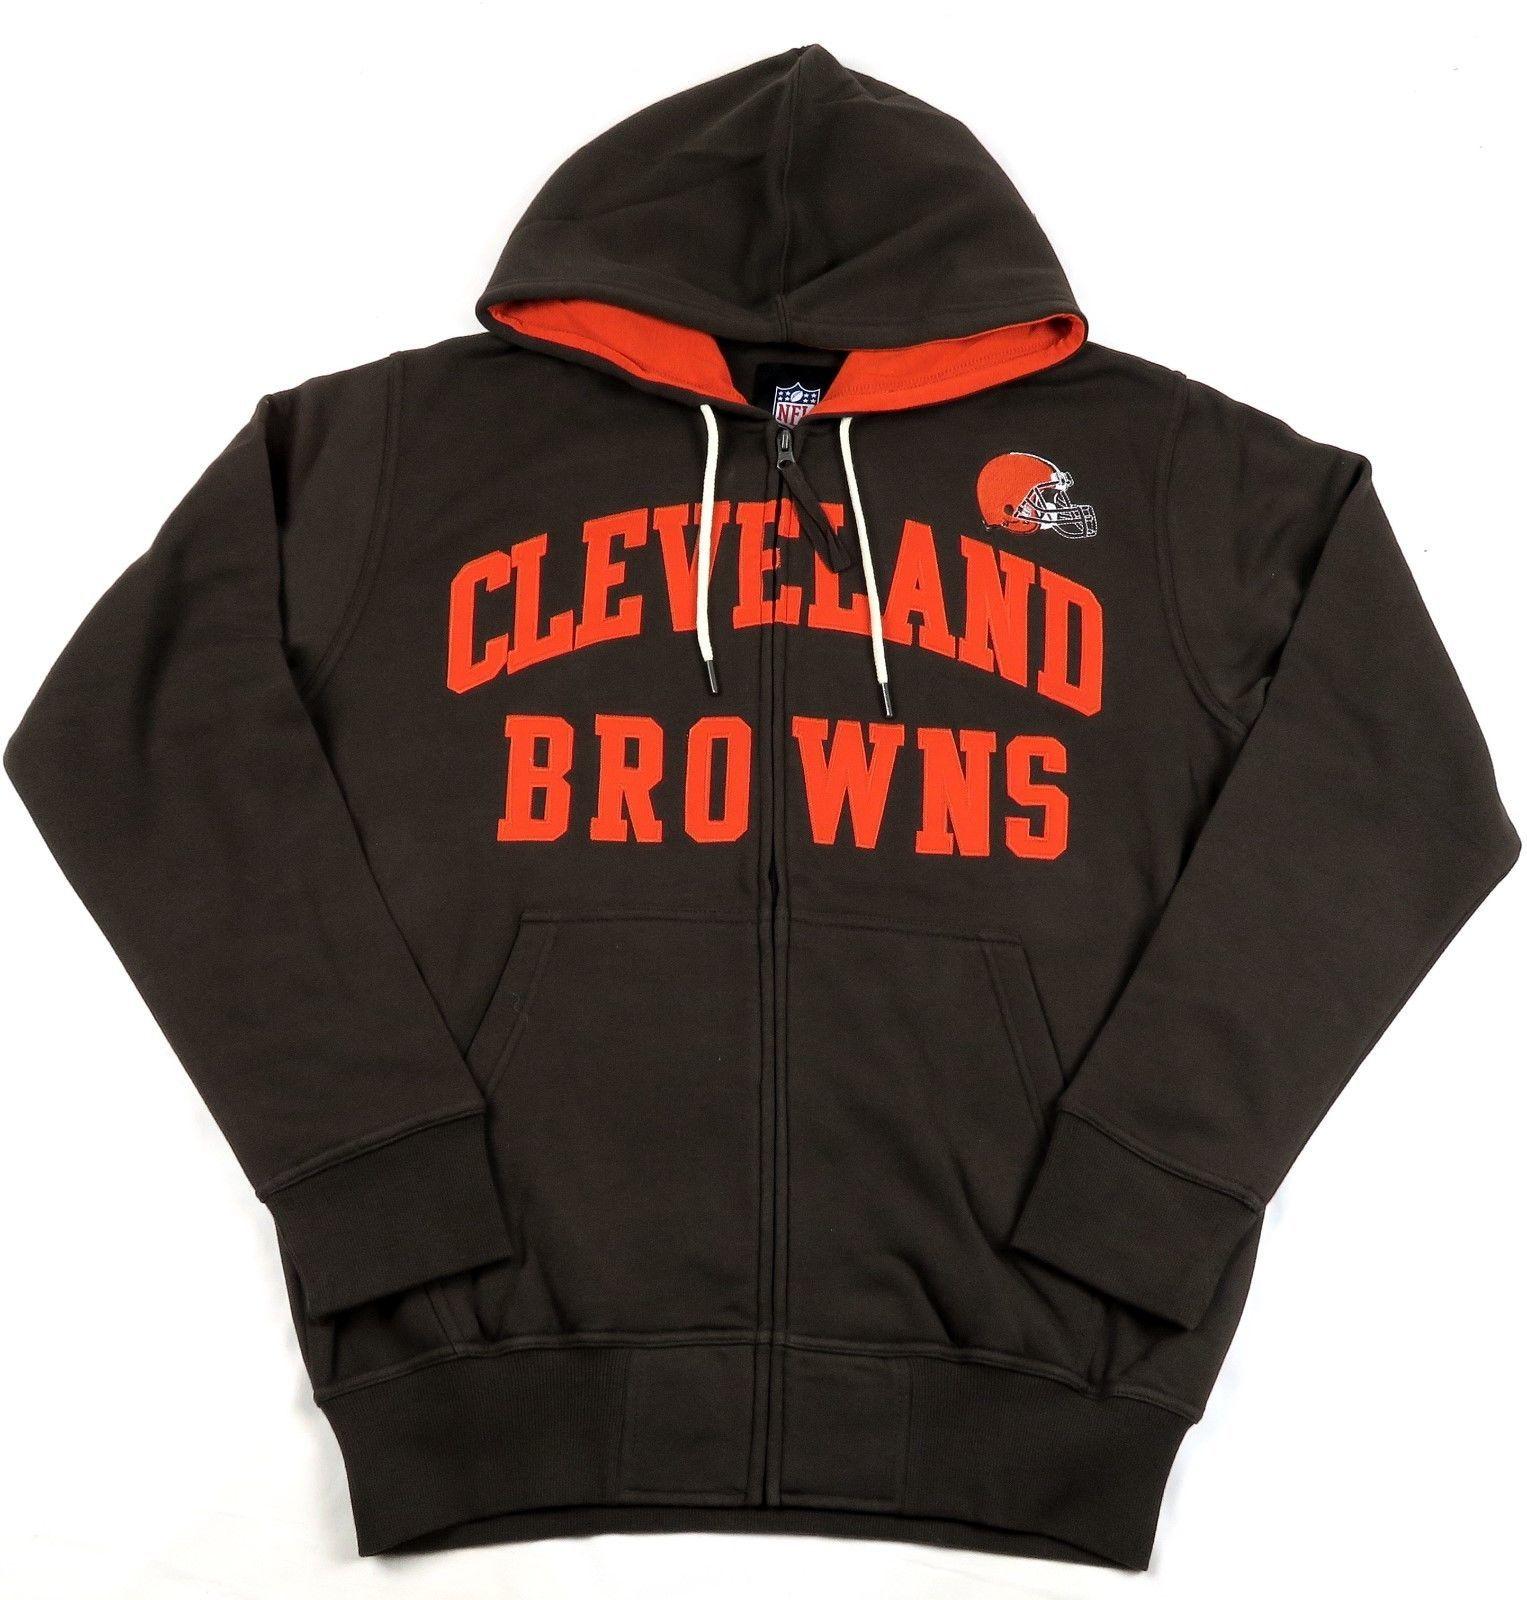 Cleveland Browns Hoodie Men's NFL Pass Attempt Full Zip Sweatshirt Hooded NEW